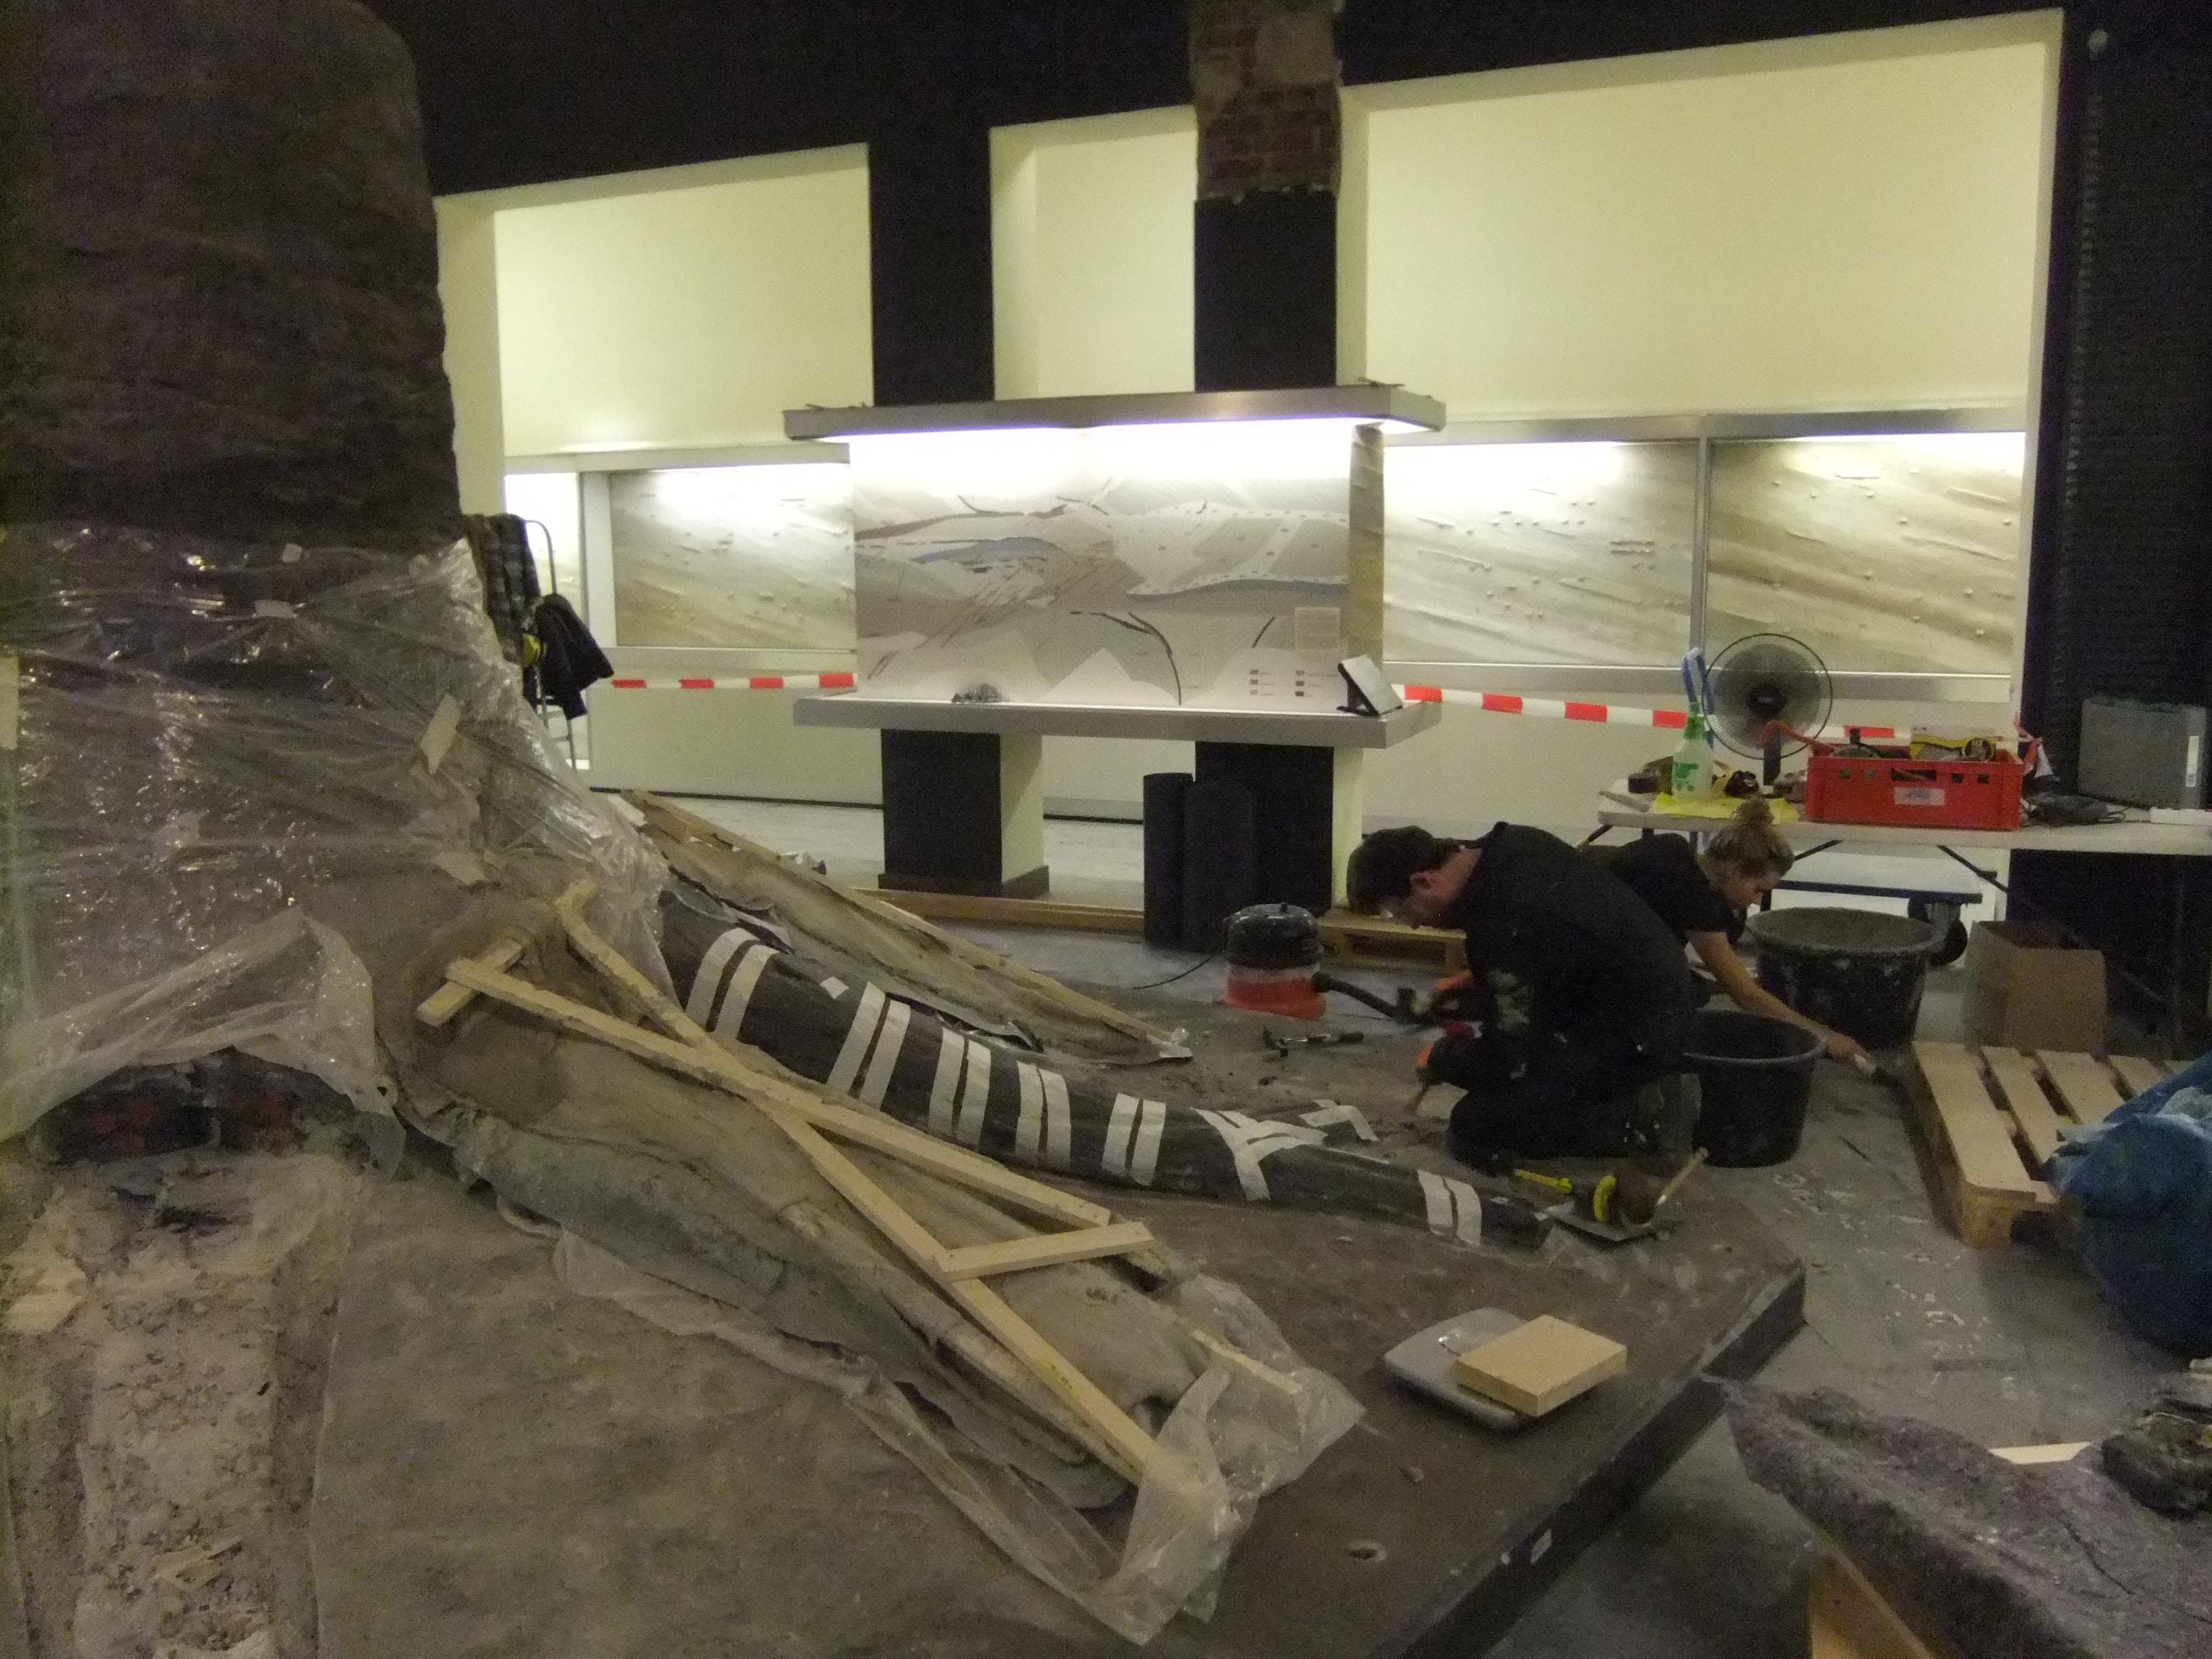 Fossielen & Dinosauriërs | Demontage Fossiele Boom II | Bergbaumuseum Bochum, Duitsland